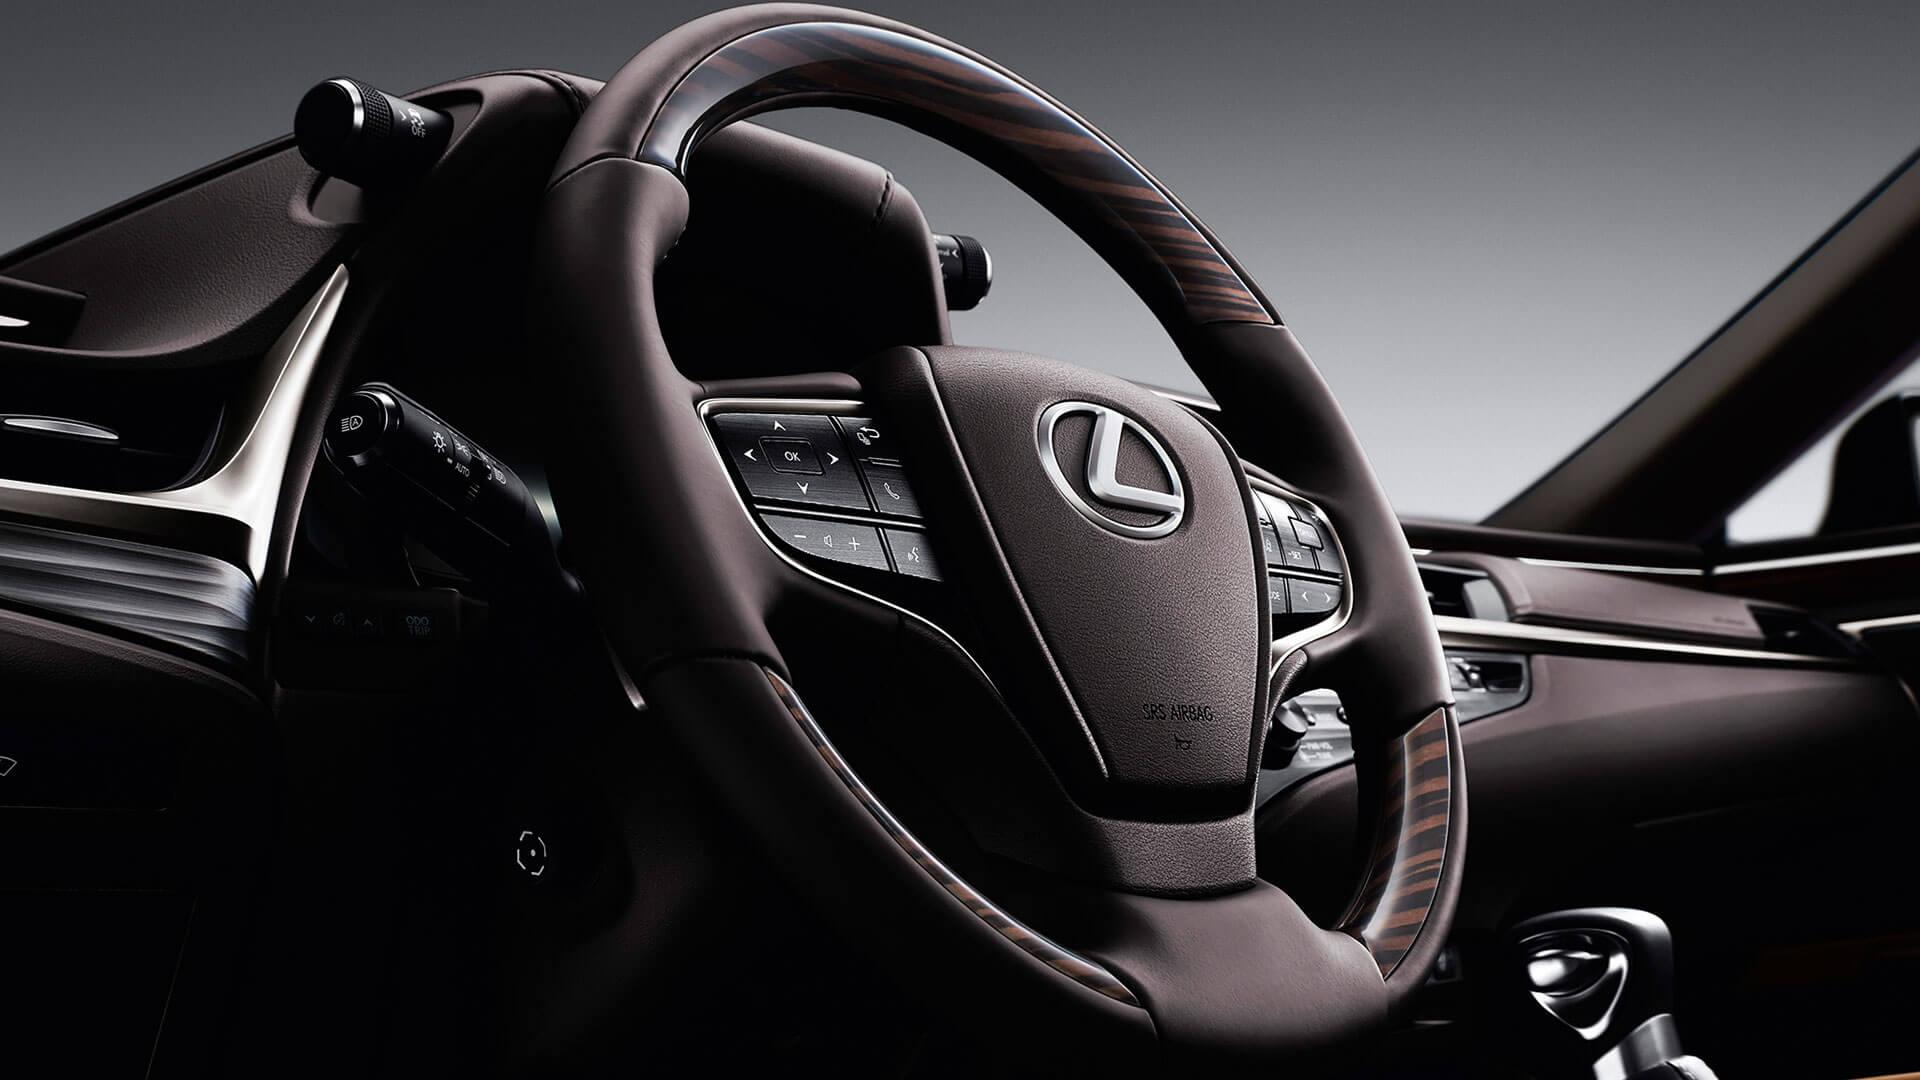 2019 lexus es hybrid experience feature leather steering wheel